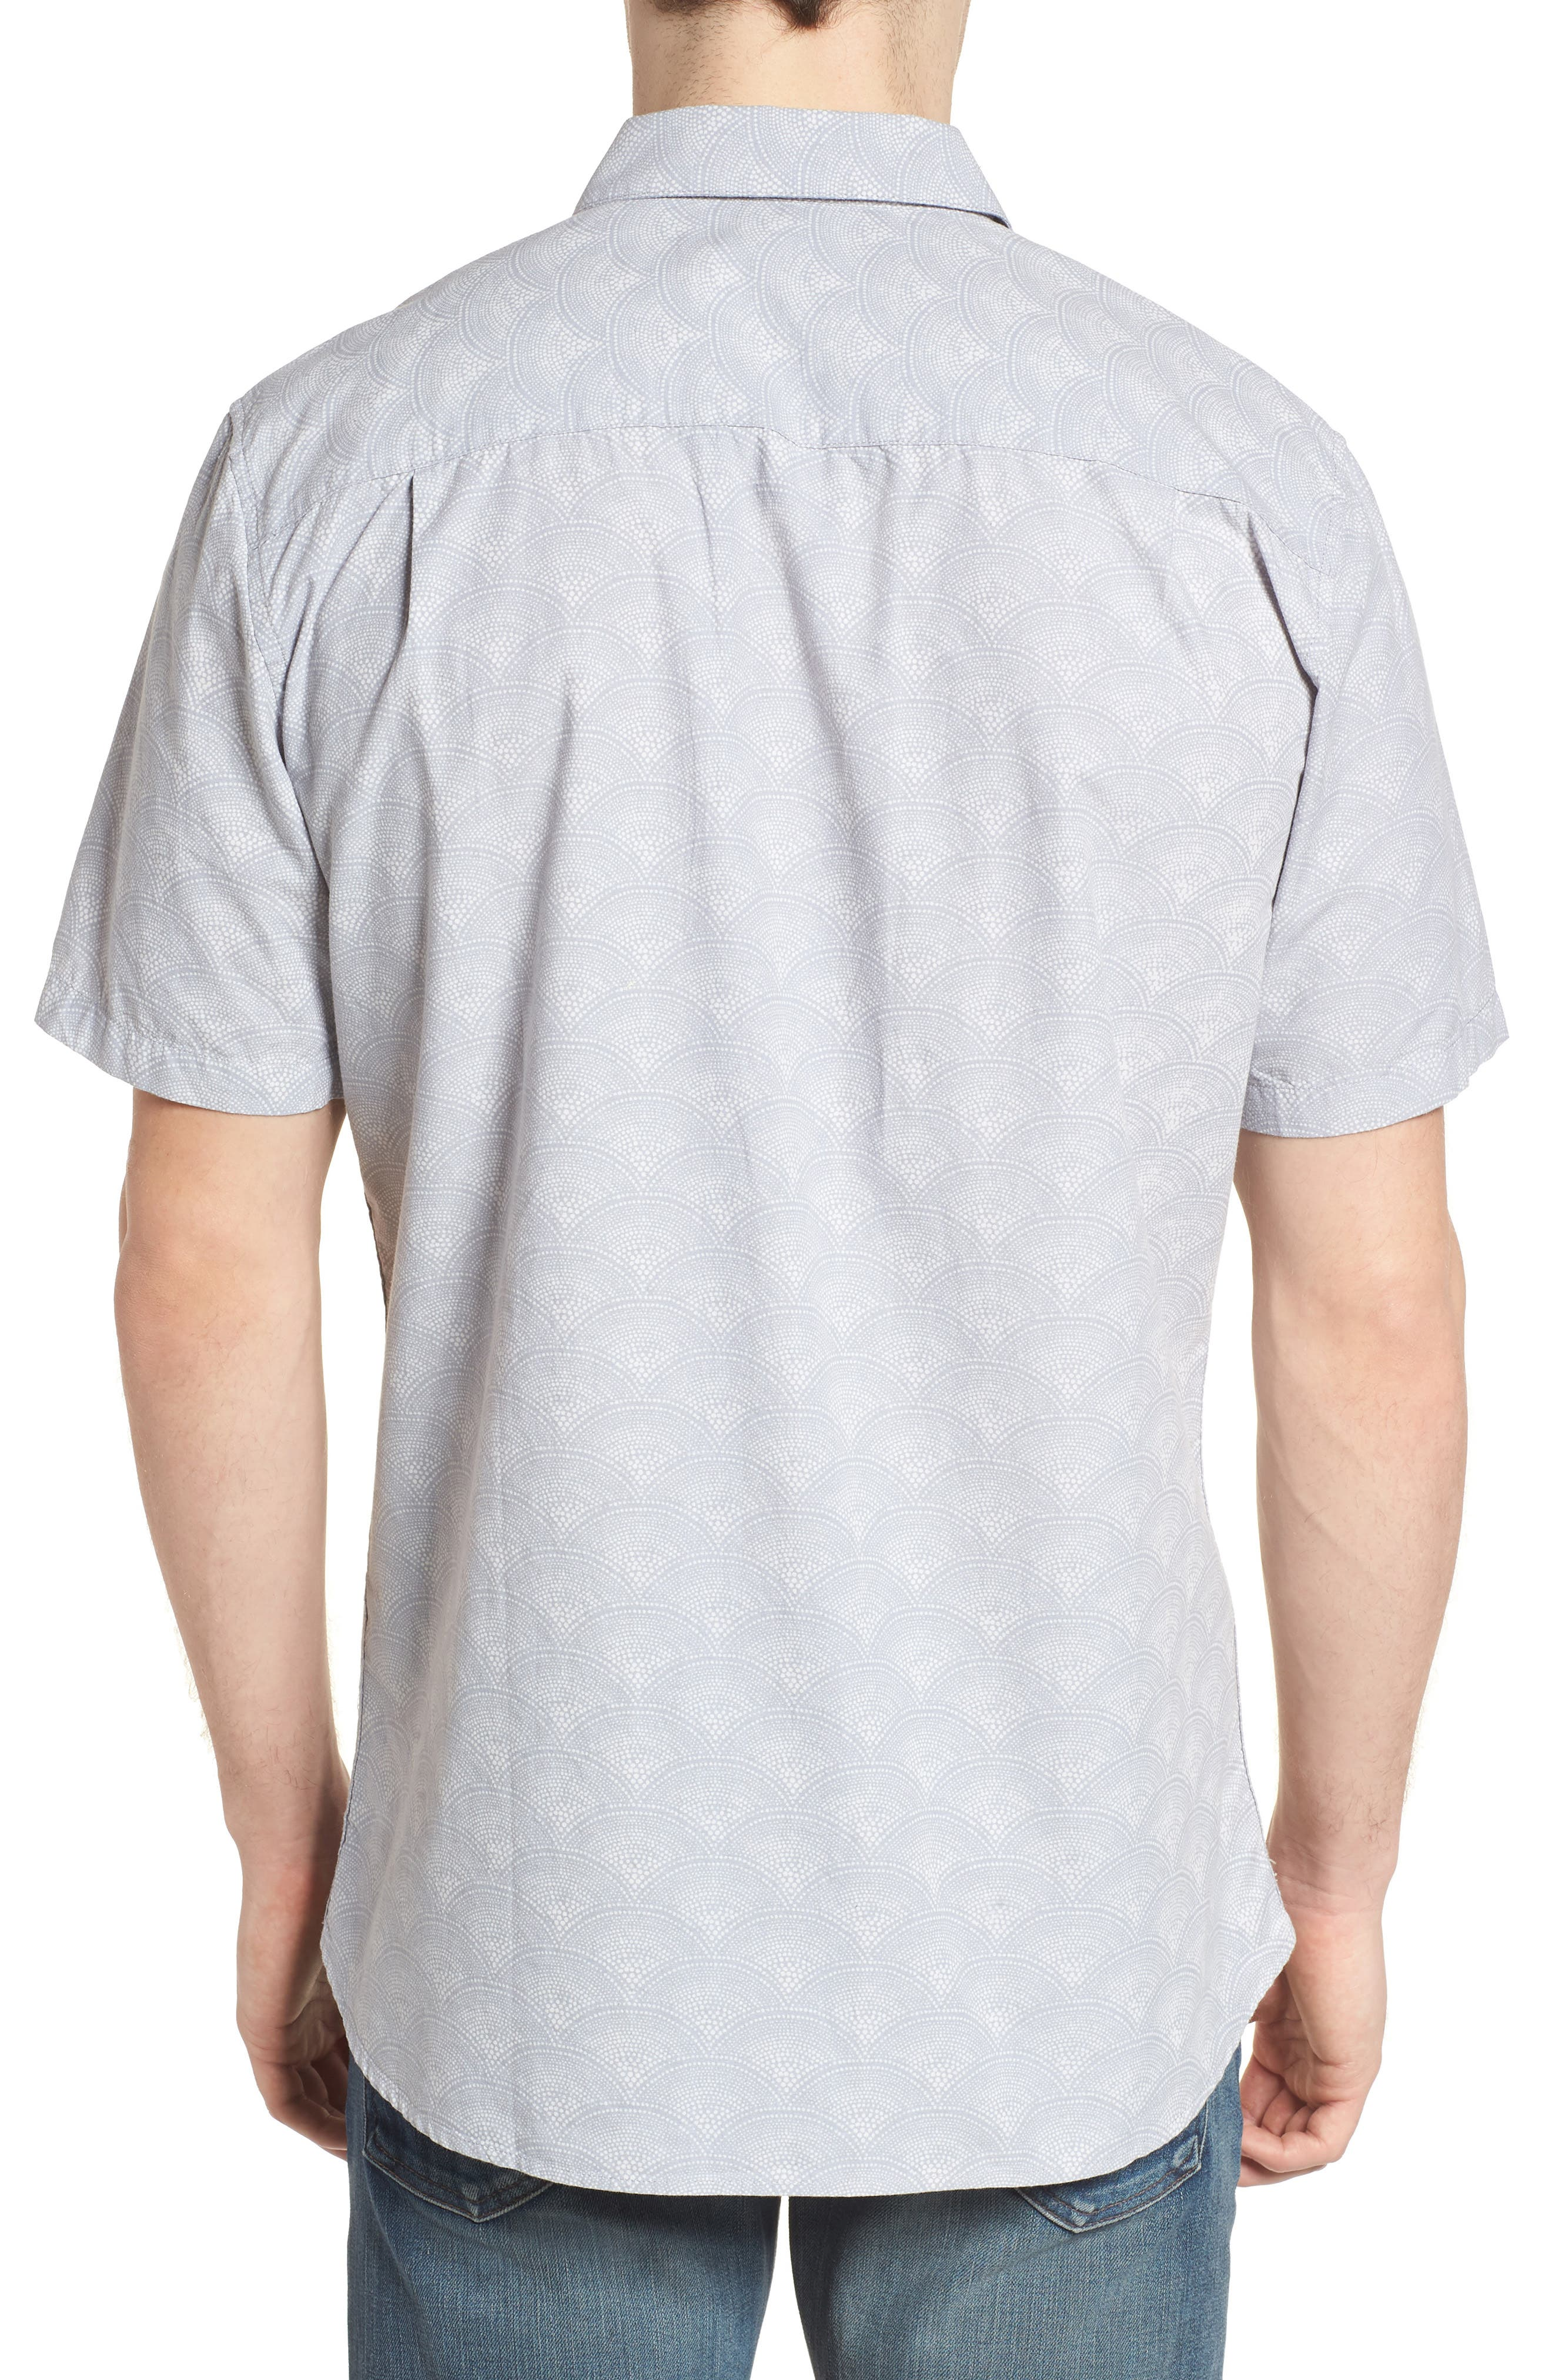 Pescado Short Sleeve Oxford Shirt,                             Alternate thumbnail 2, color,                             LIGHT PUMICE